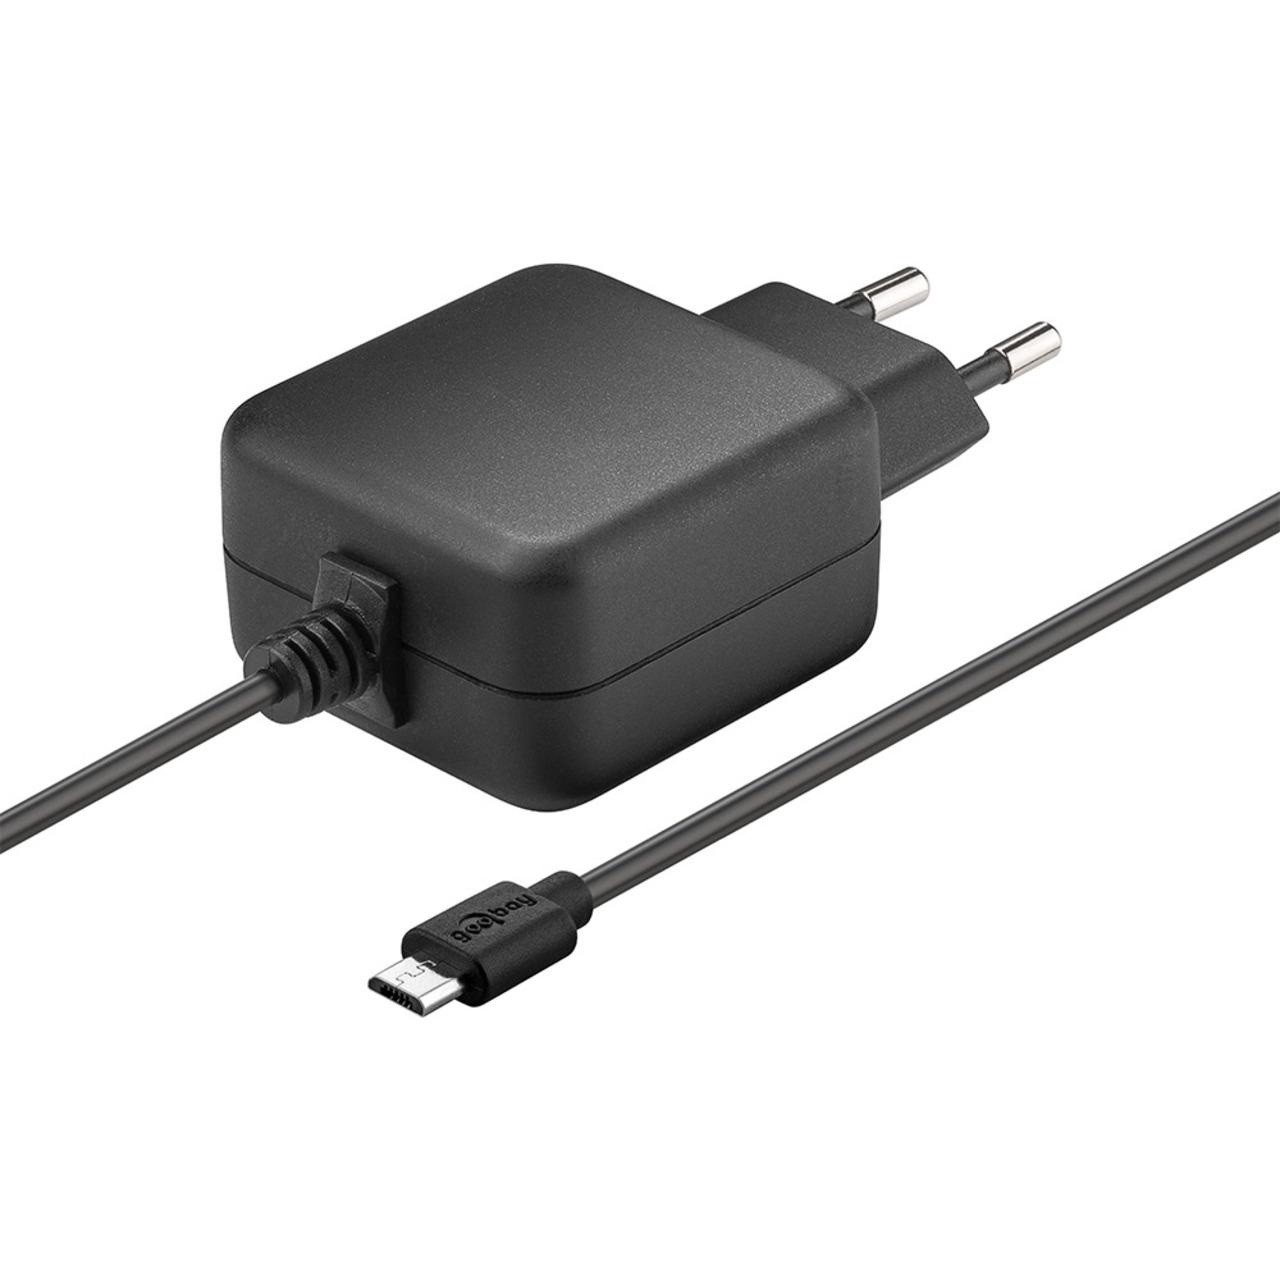 Goobay Micro-USB-Netzteil (5 V-3-1 A) für Raspberry Pi 1- 2- 3 (Raspberry Pi 4 mit Typ-C-Adapter)